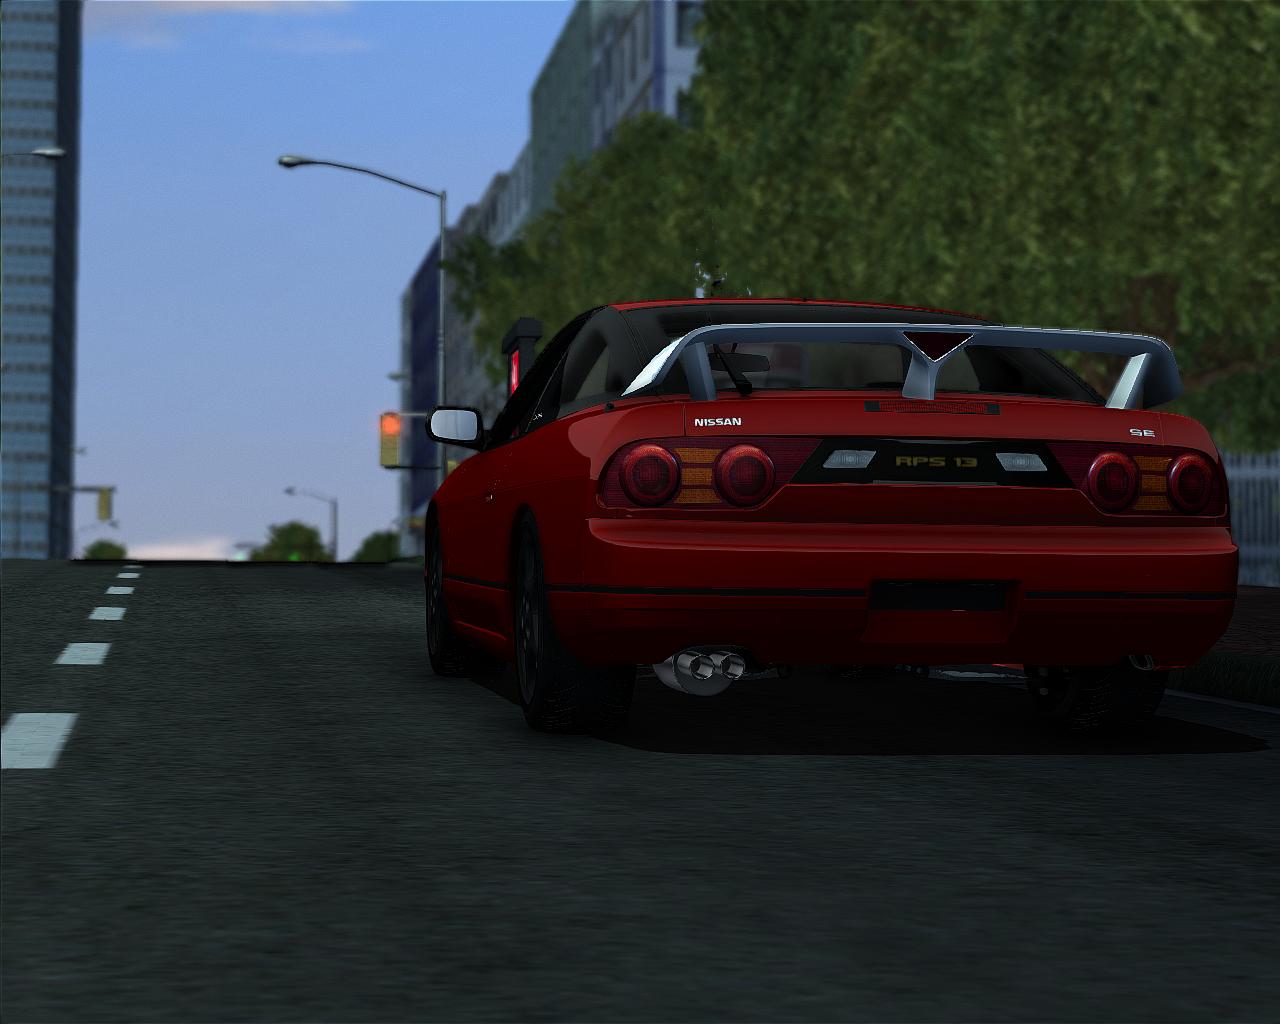 Nissan RPS 13